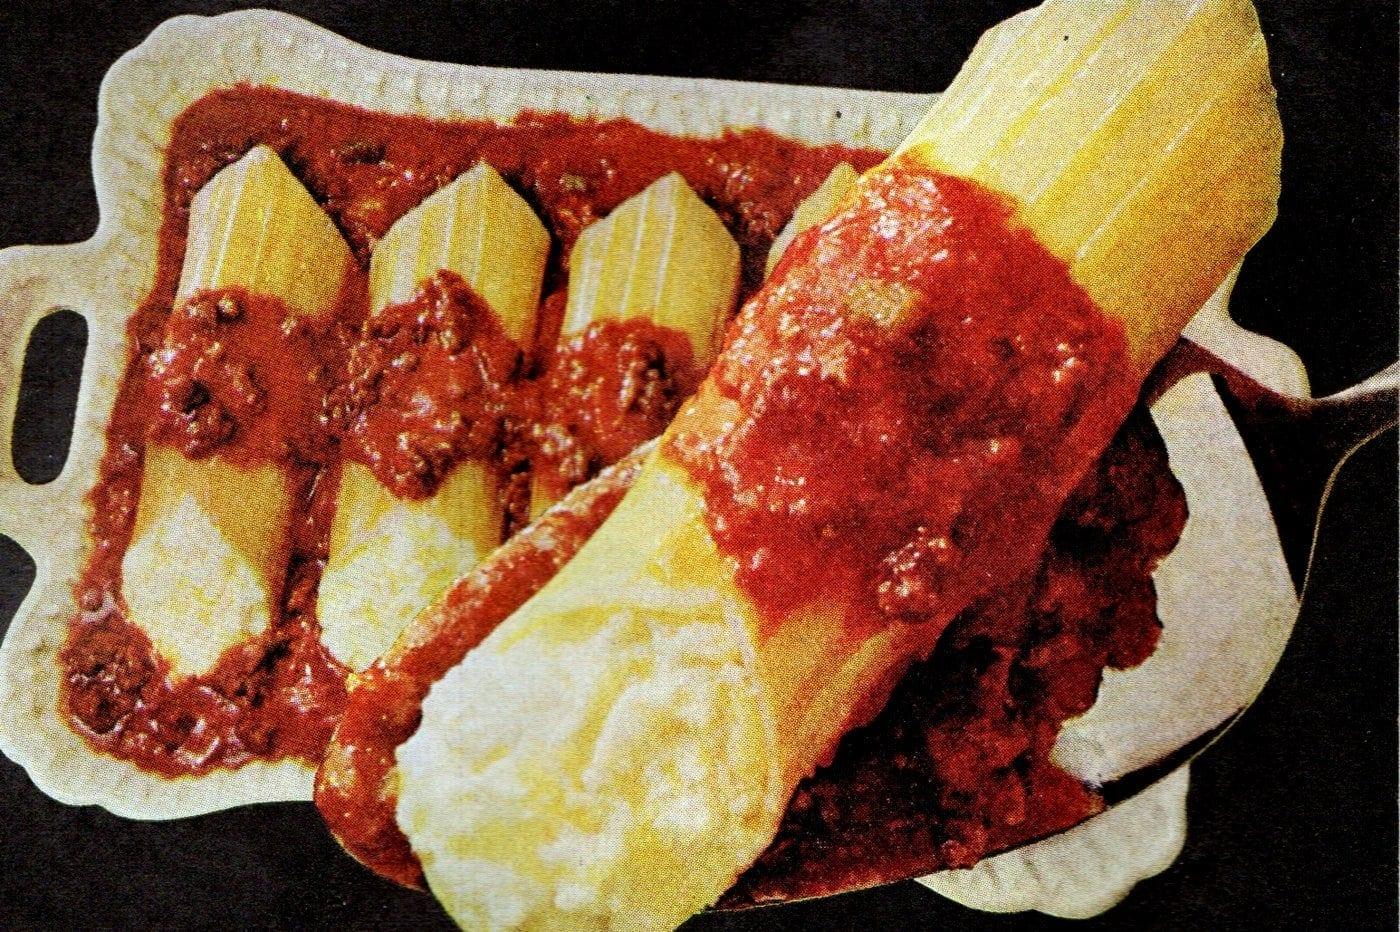 Retro recipe - Manicotti-Cheese Bake (1968)